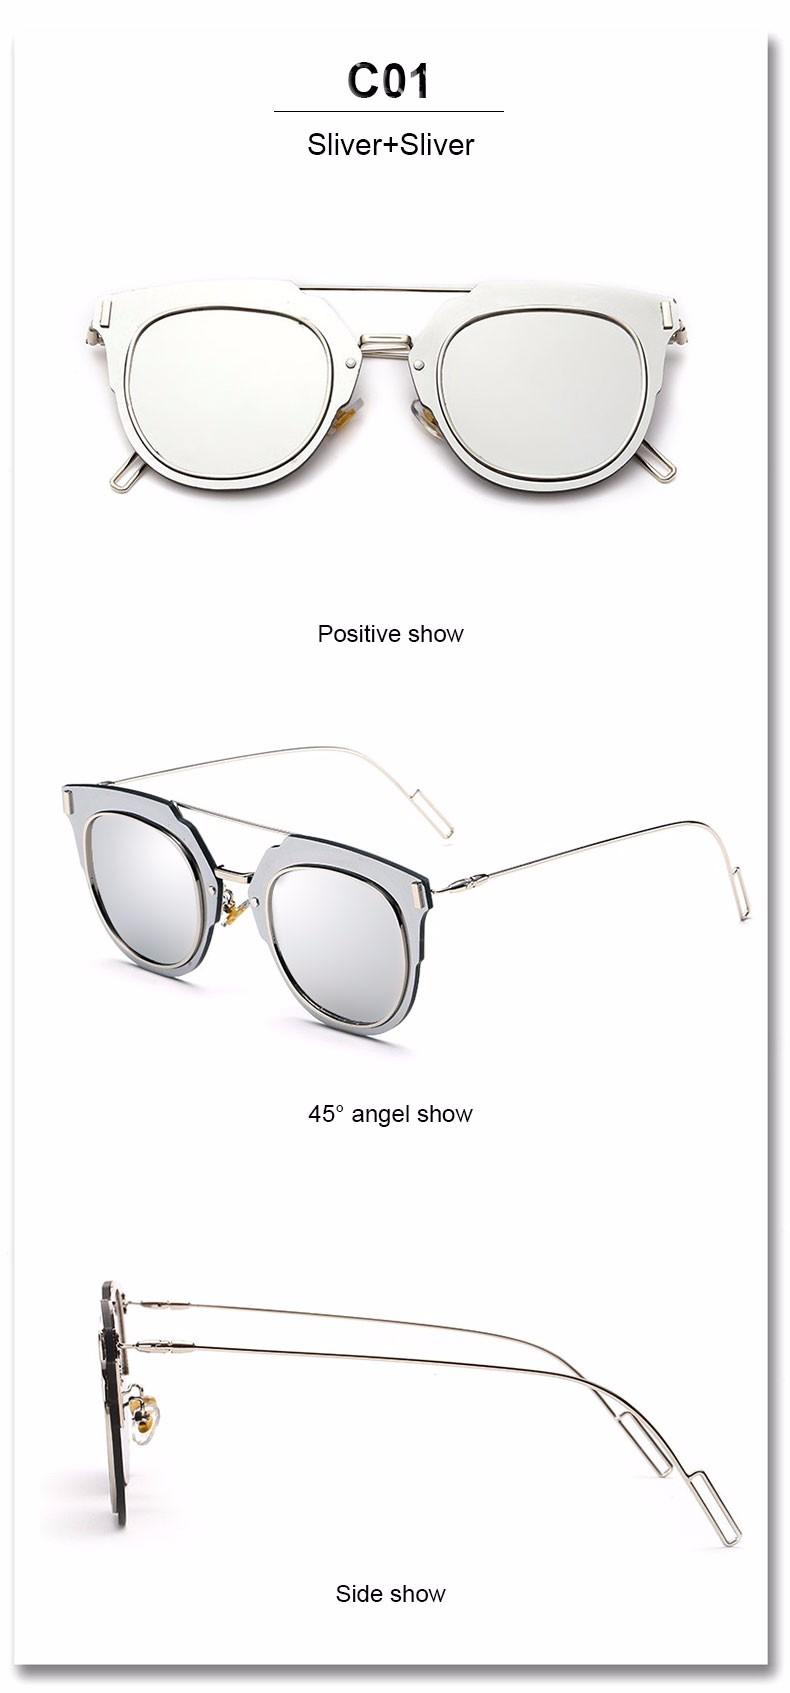 0fe6d5a327759 ... designer de Marca de Moda Lady Óculos de Sol Feminino. 1 2 3. 5 6. A14  (2)----- A15 C1 ...